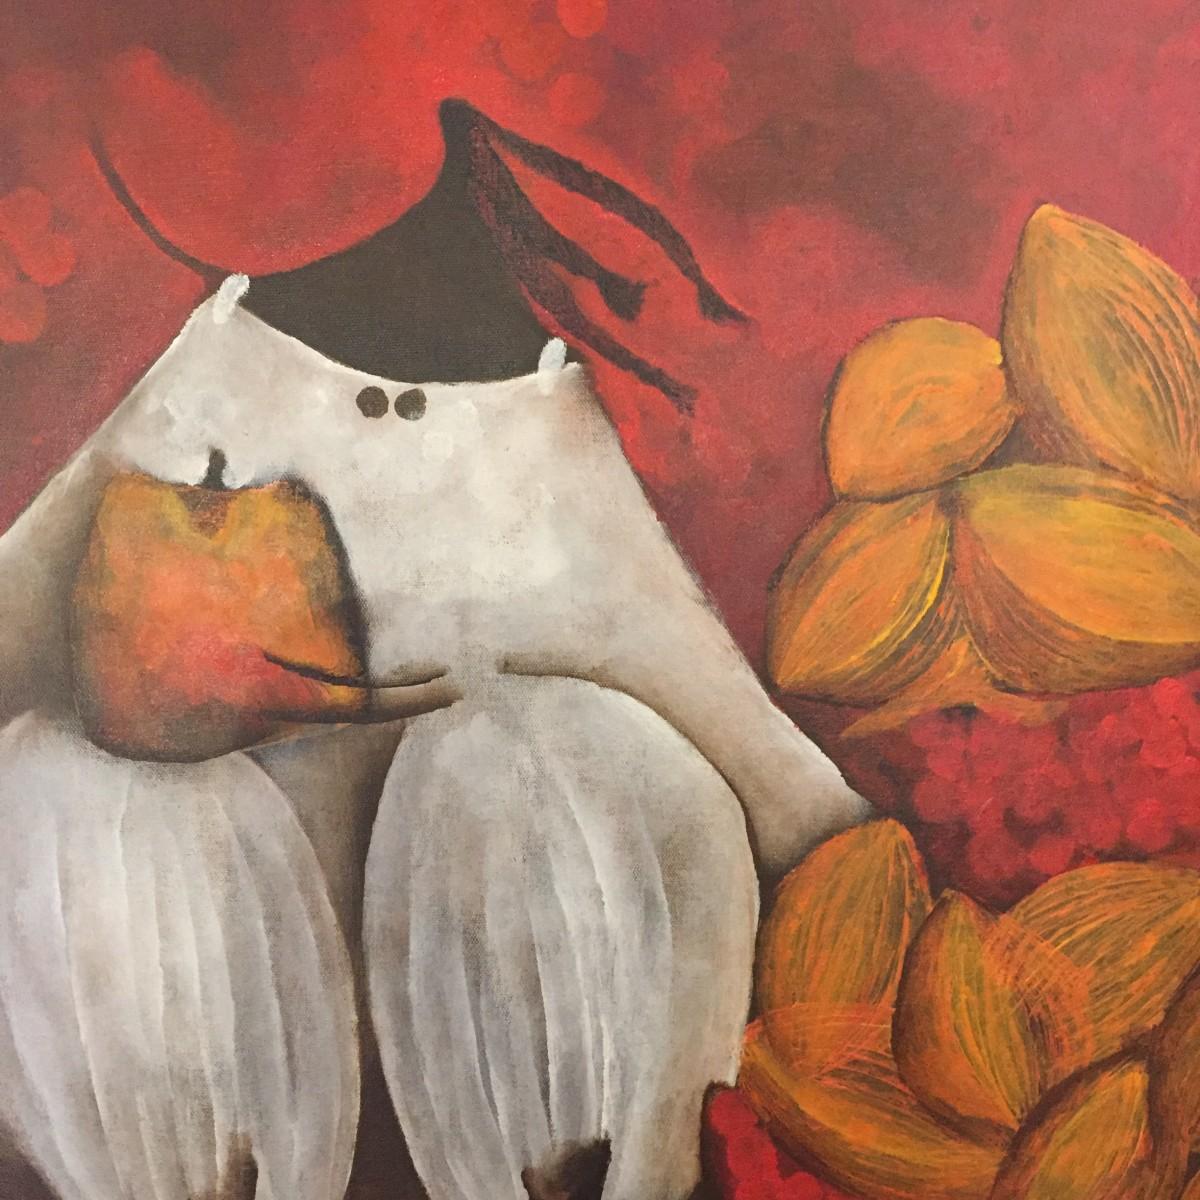 """CON CHIRIS"" by LUCIAROHRMANN"